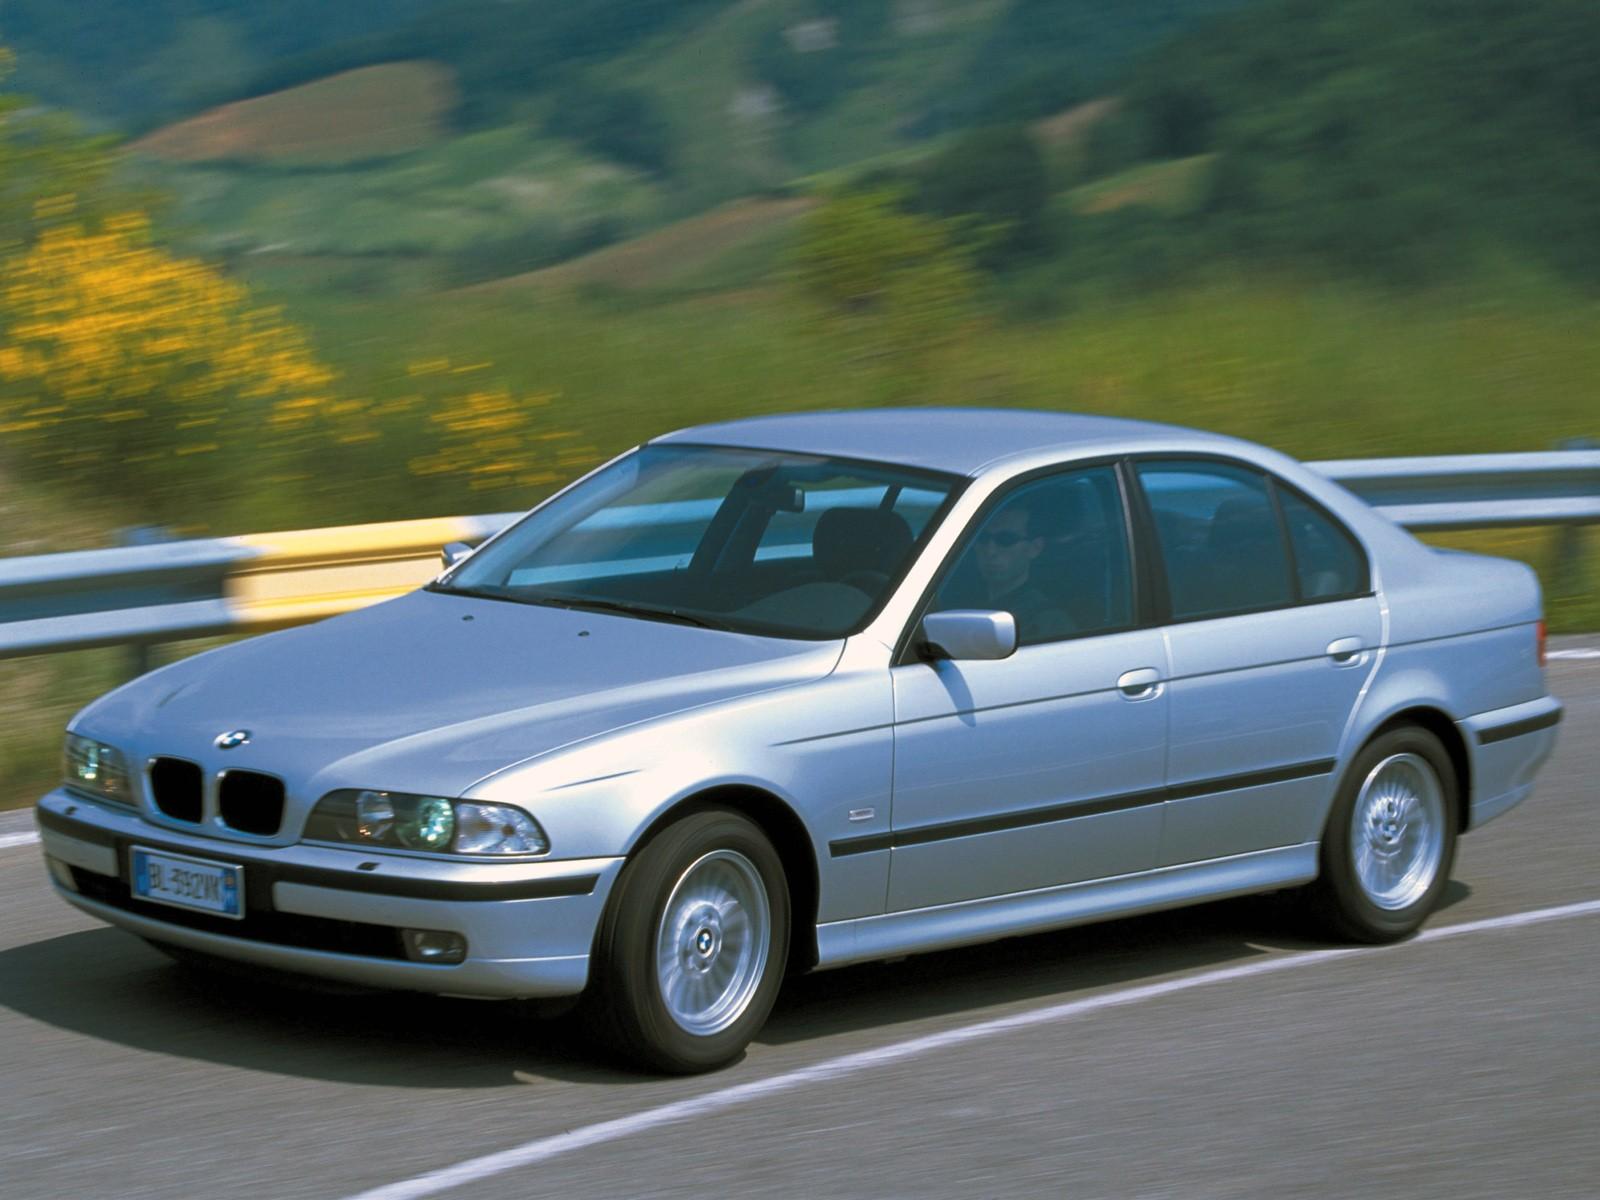 bmw e39 2000 2003 series 530d 1999 520d sedan 2002 cars 2001 autoevolution lookatthecar